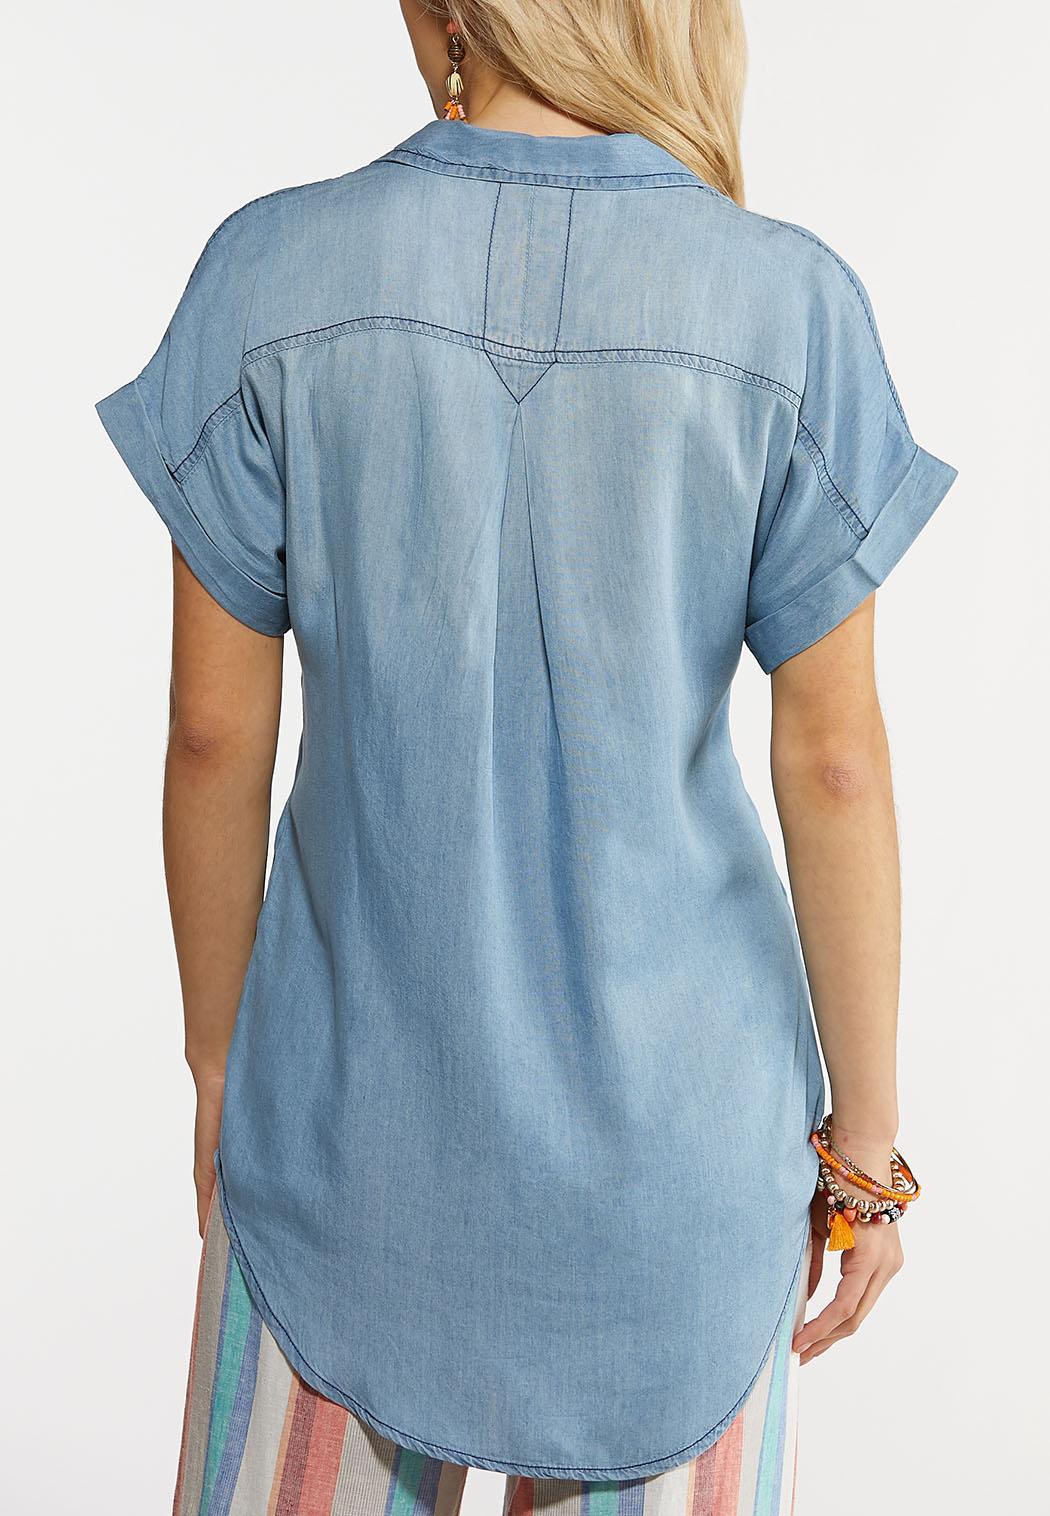 Chambray Cuffed Sleeve Shirt (Item #44240457)